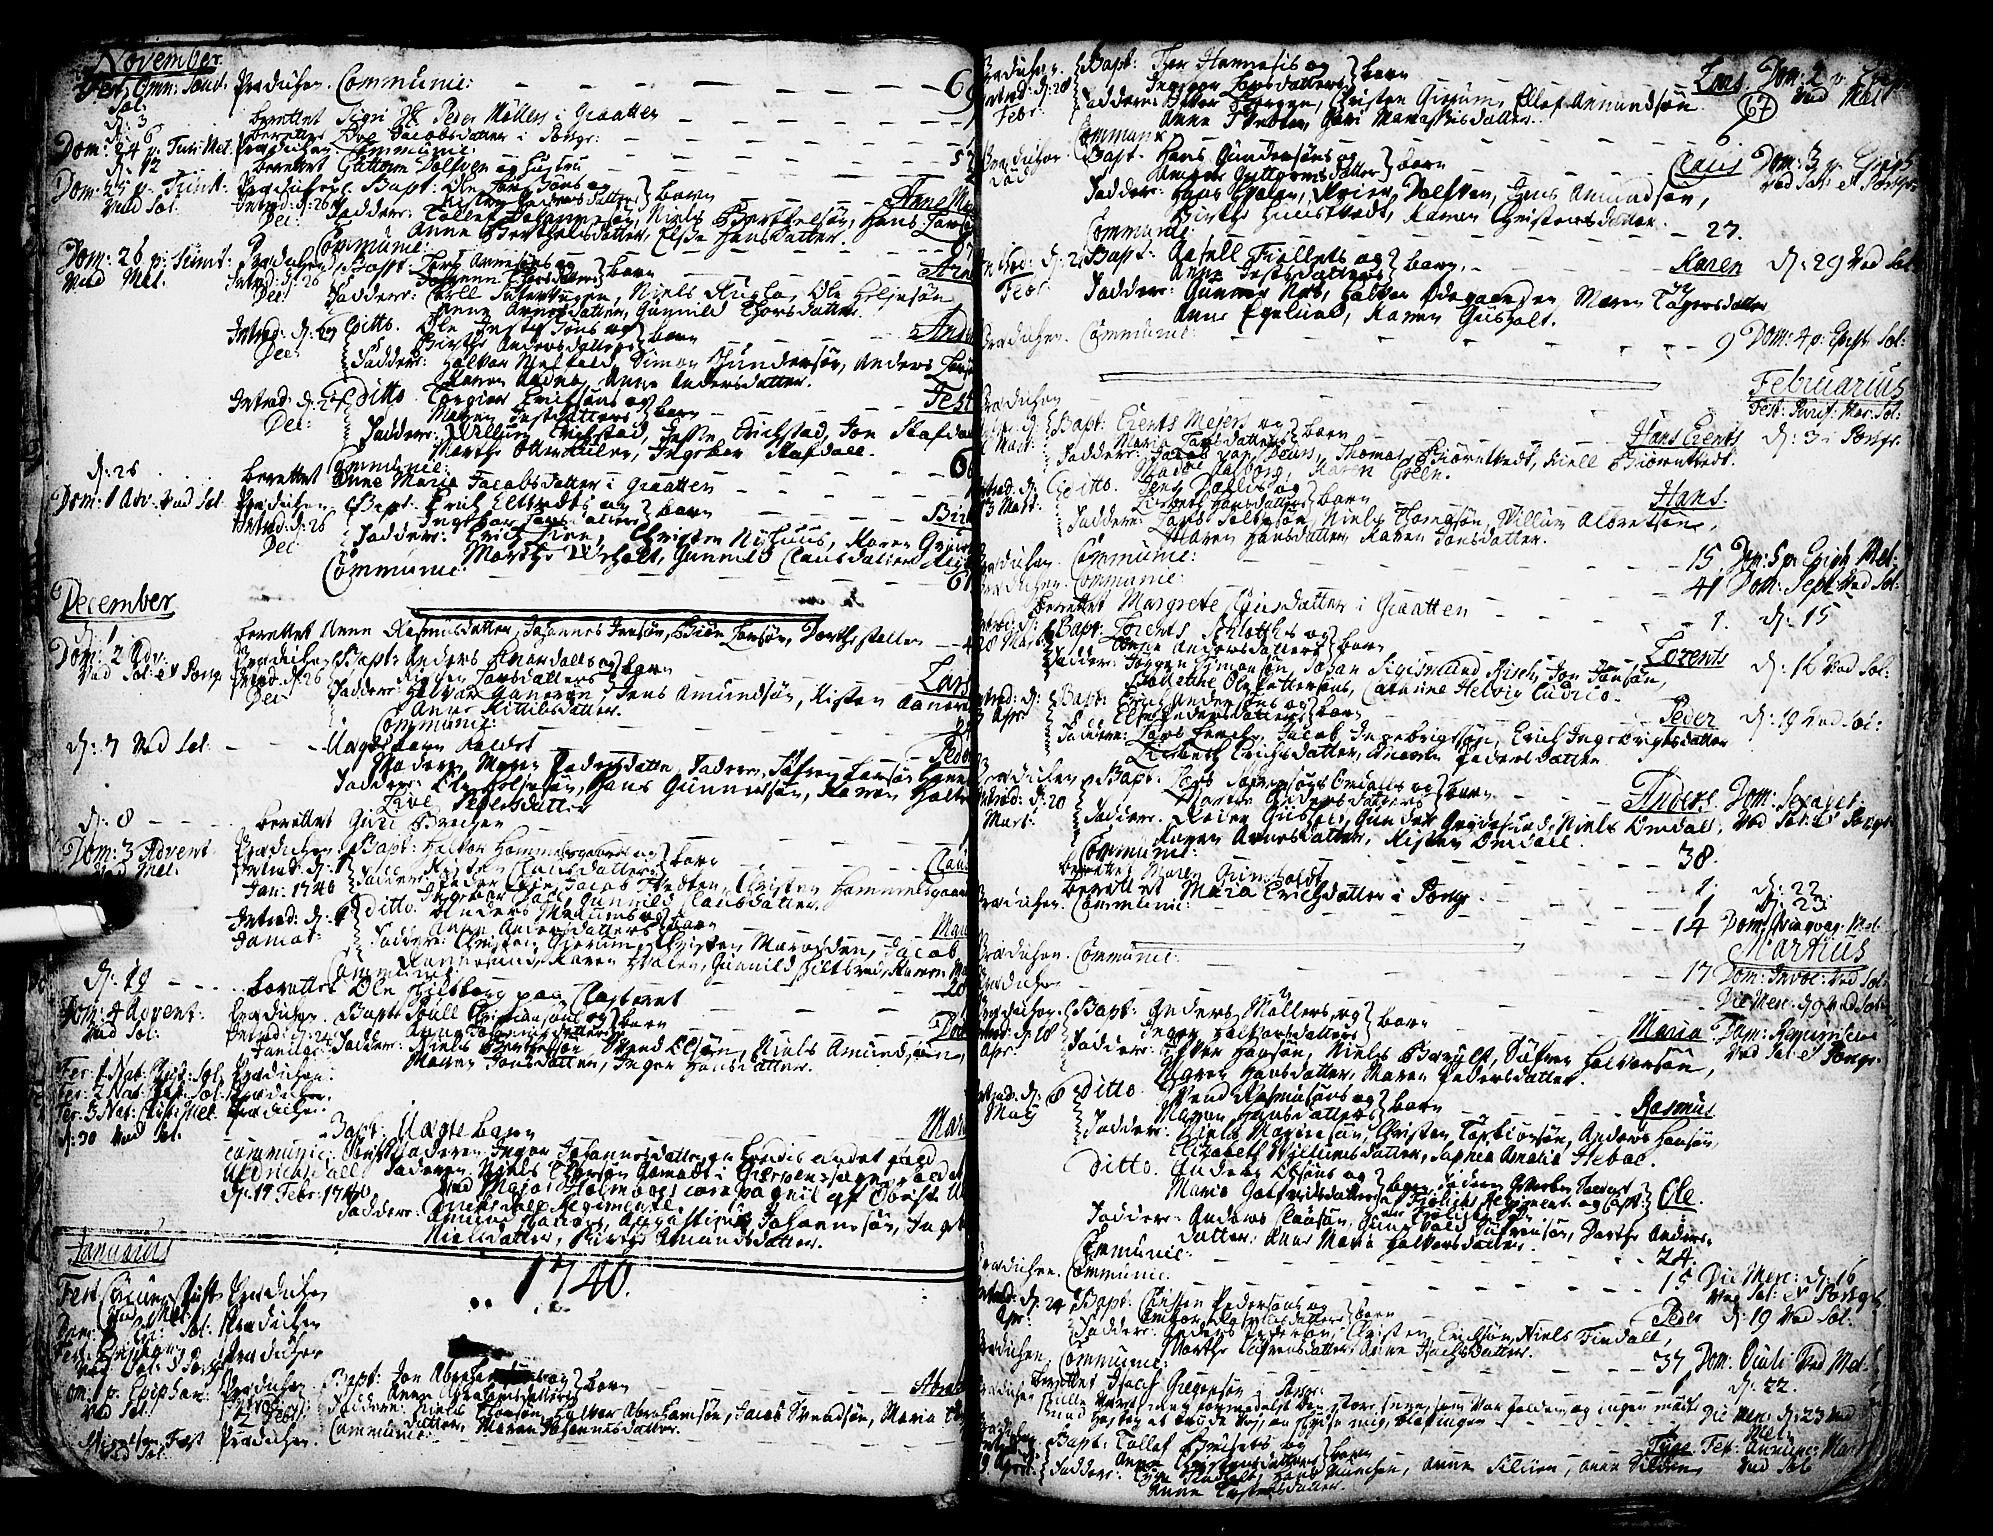 SAKO, Solum kirkebøker, F/Fa/L0002: Ministerialbok nr. I 2, 1713-1761, s. 67